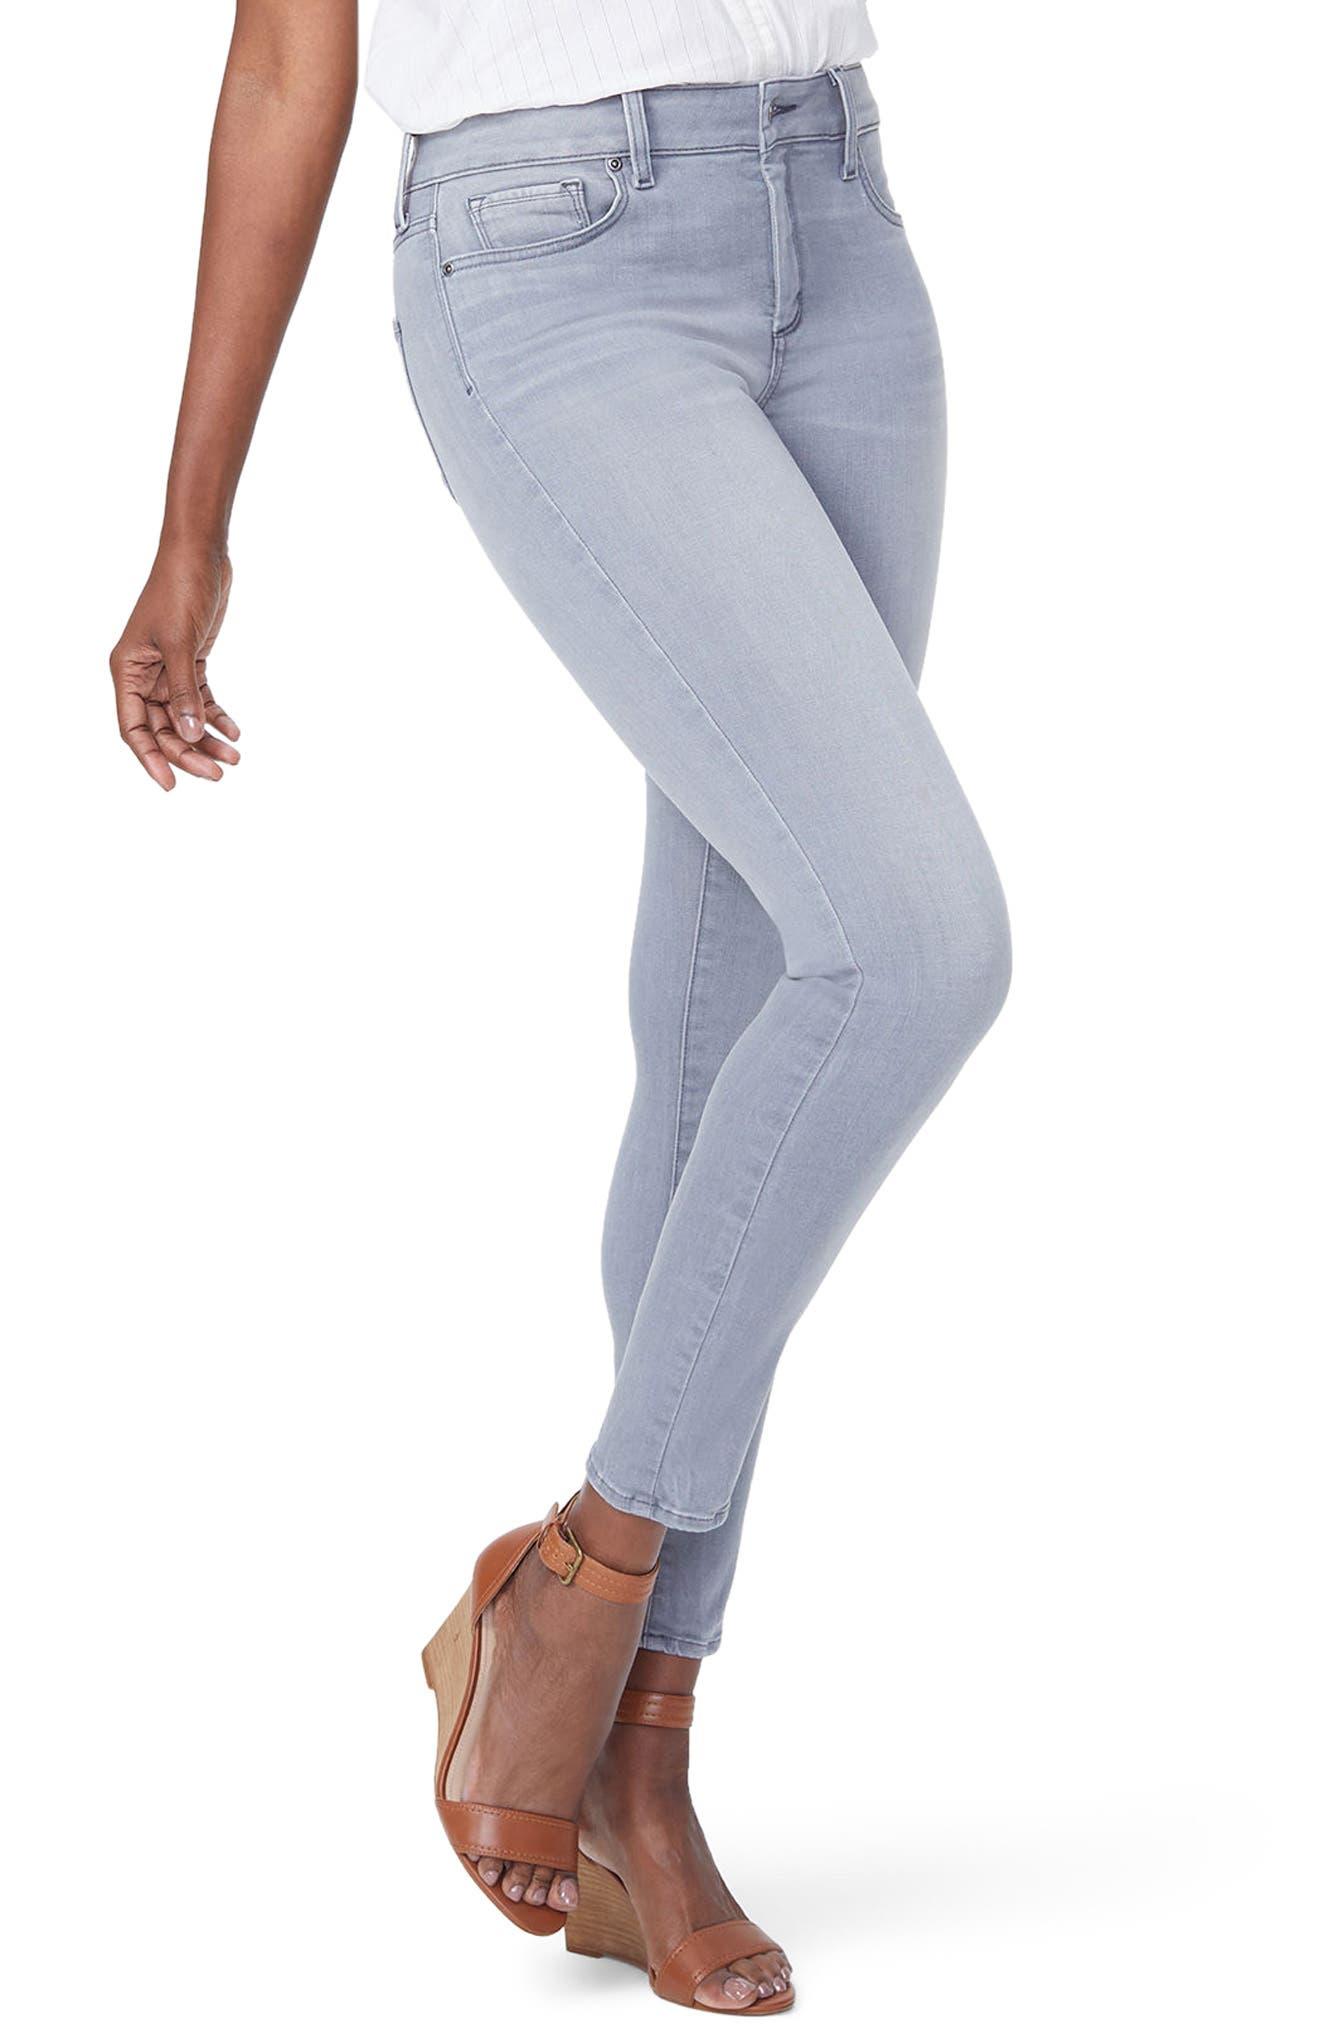 Ami Skinny Jeans,                             Main thumbnail 1, color,                             020